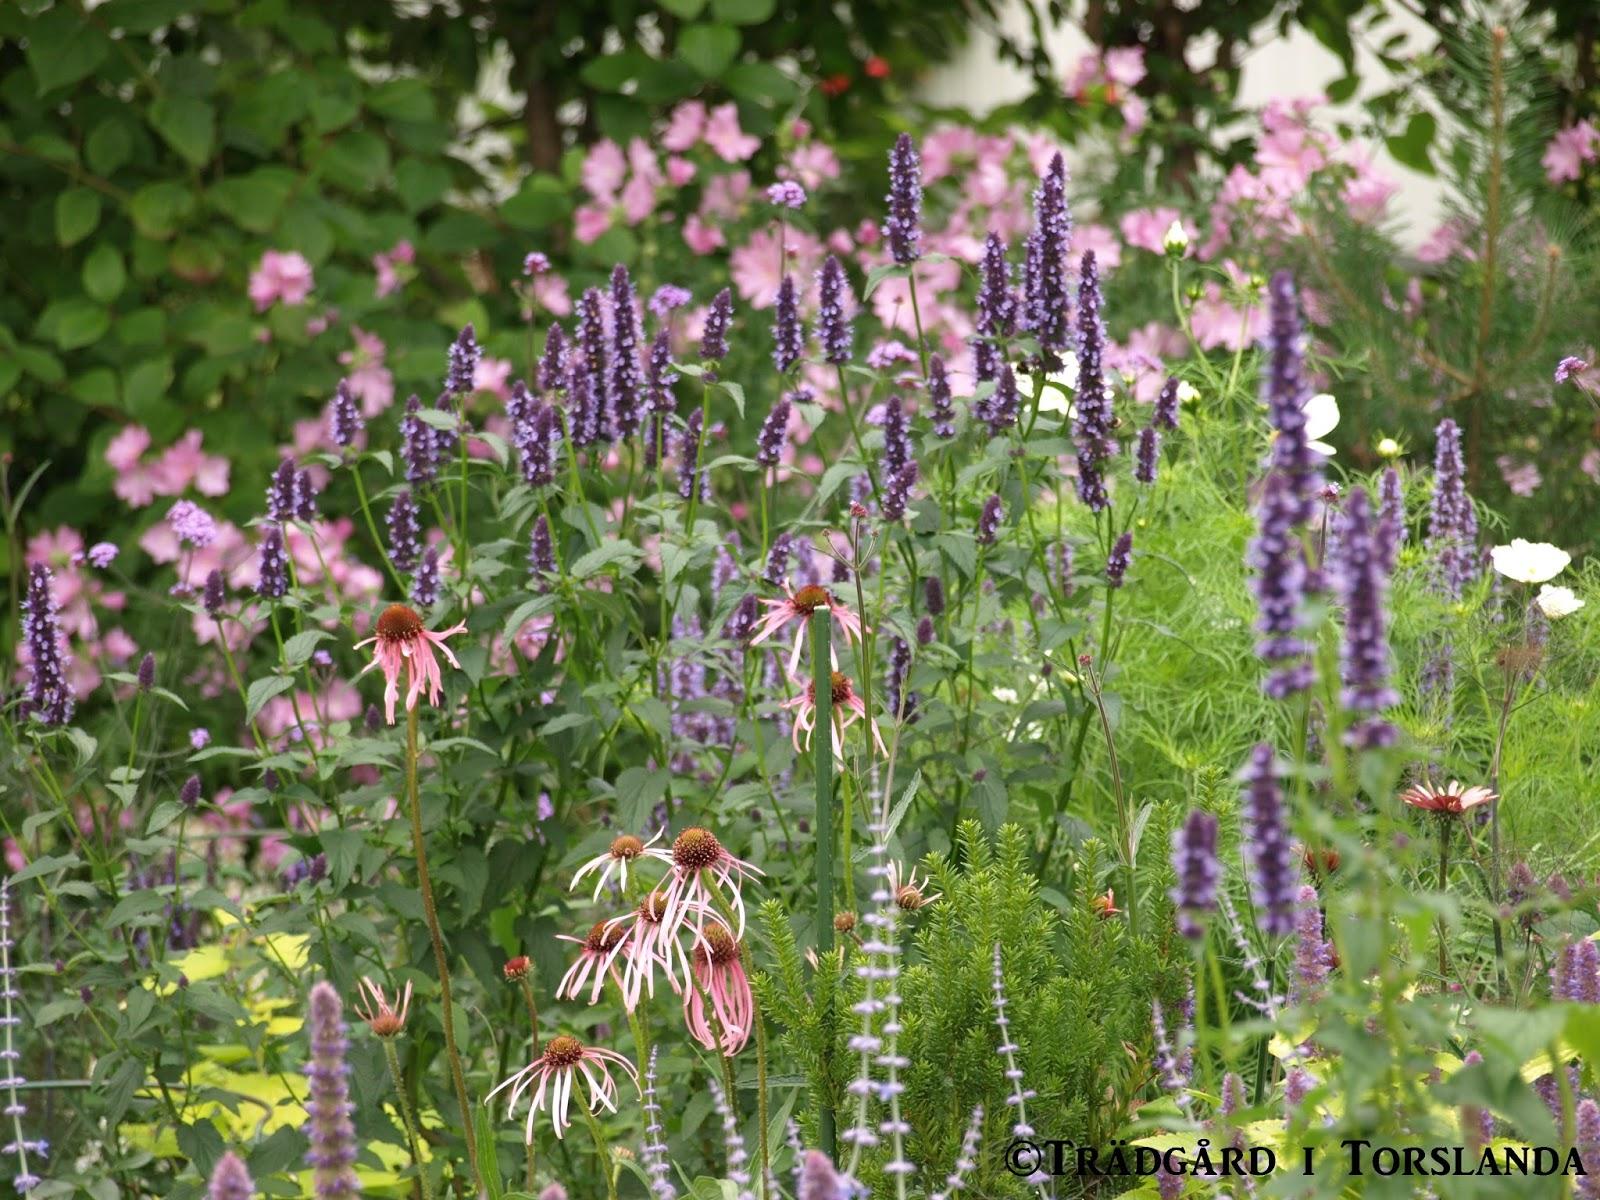 Trädgård i torslanda: agastache